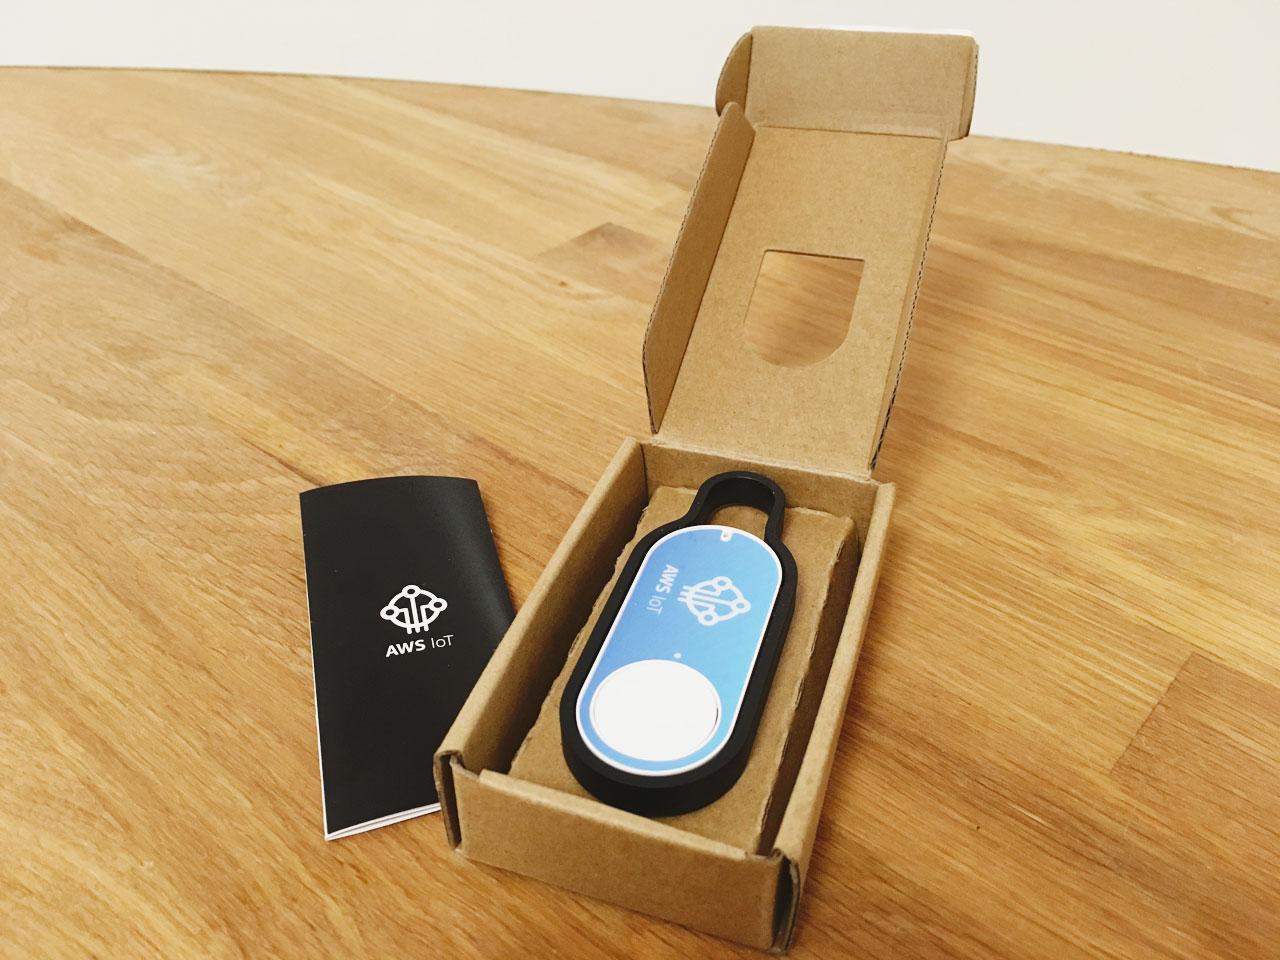 Building an IoT Doorbell Integration with Slack - New Media